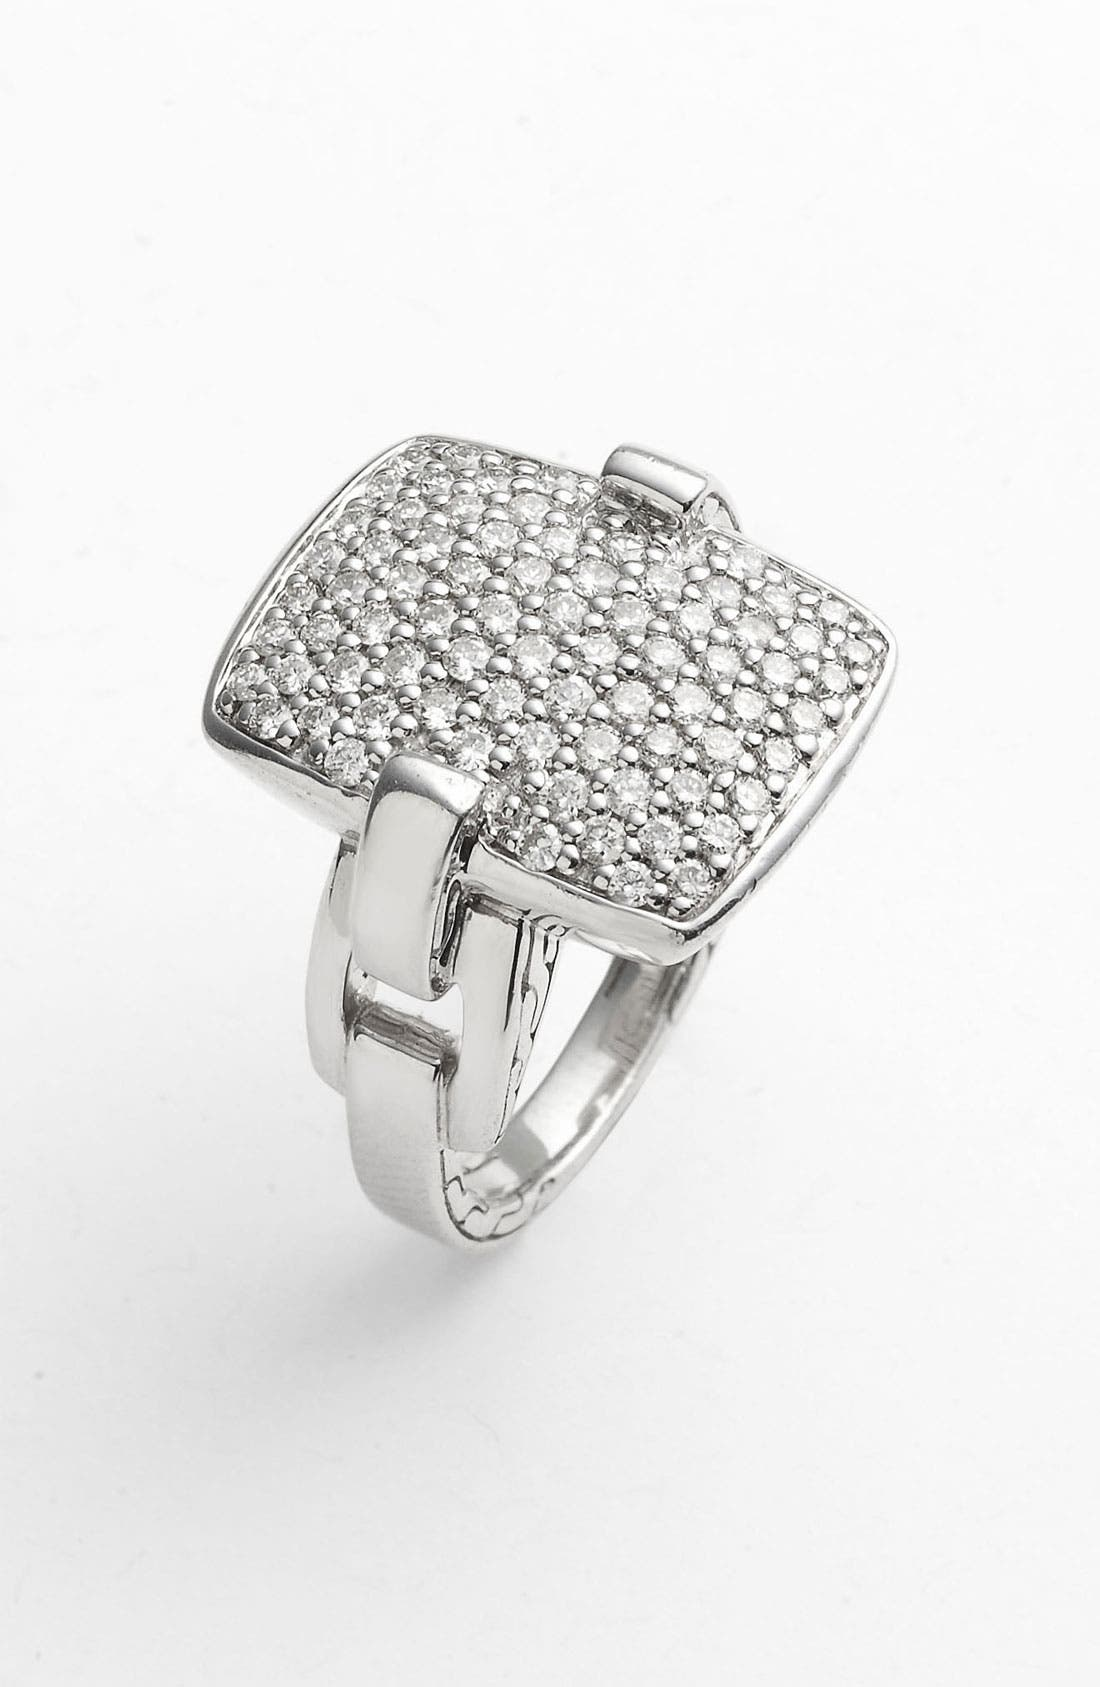 Alternate Image 1 Selected - John Hardy 'Classic Chain' Rectangular Diamond Pavé Ring